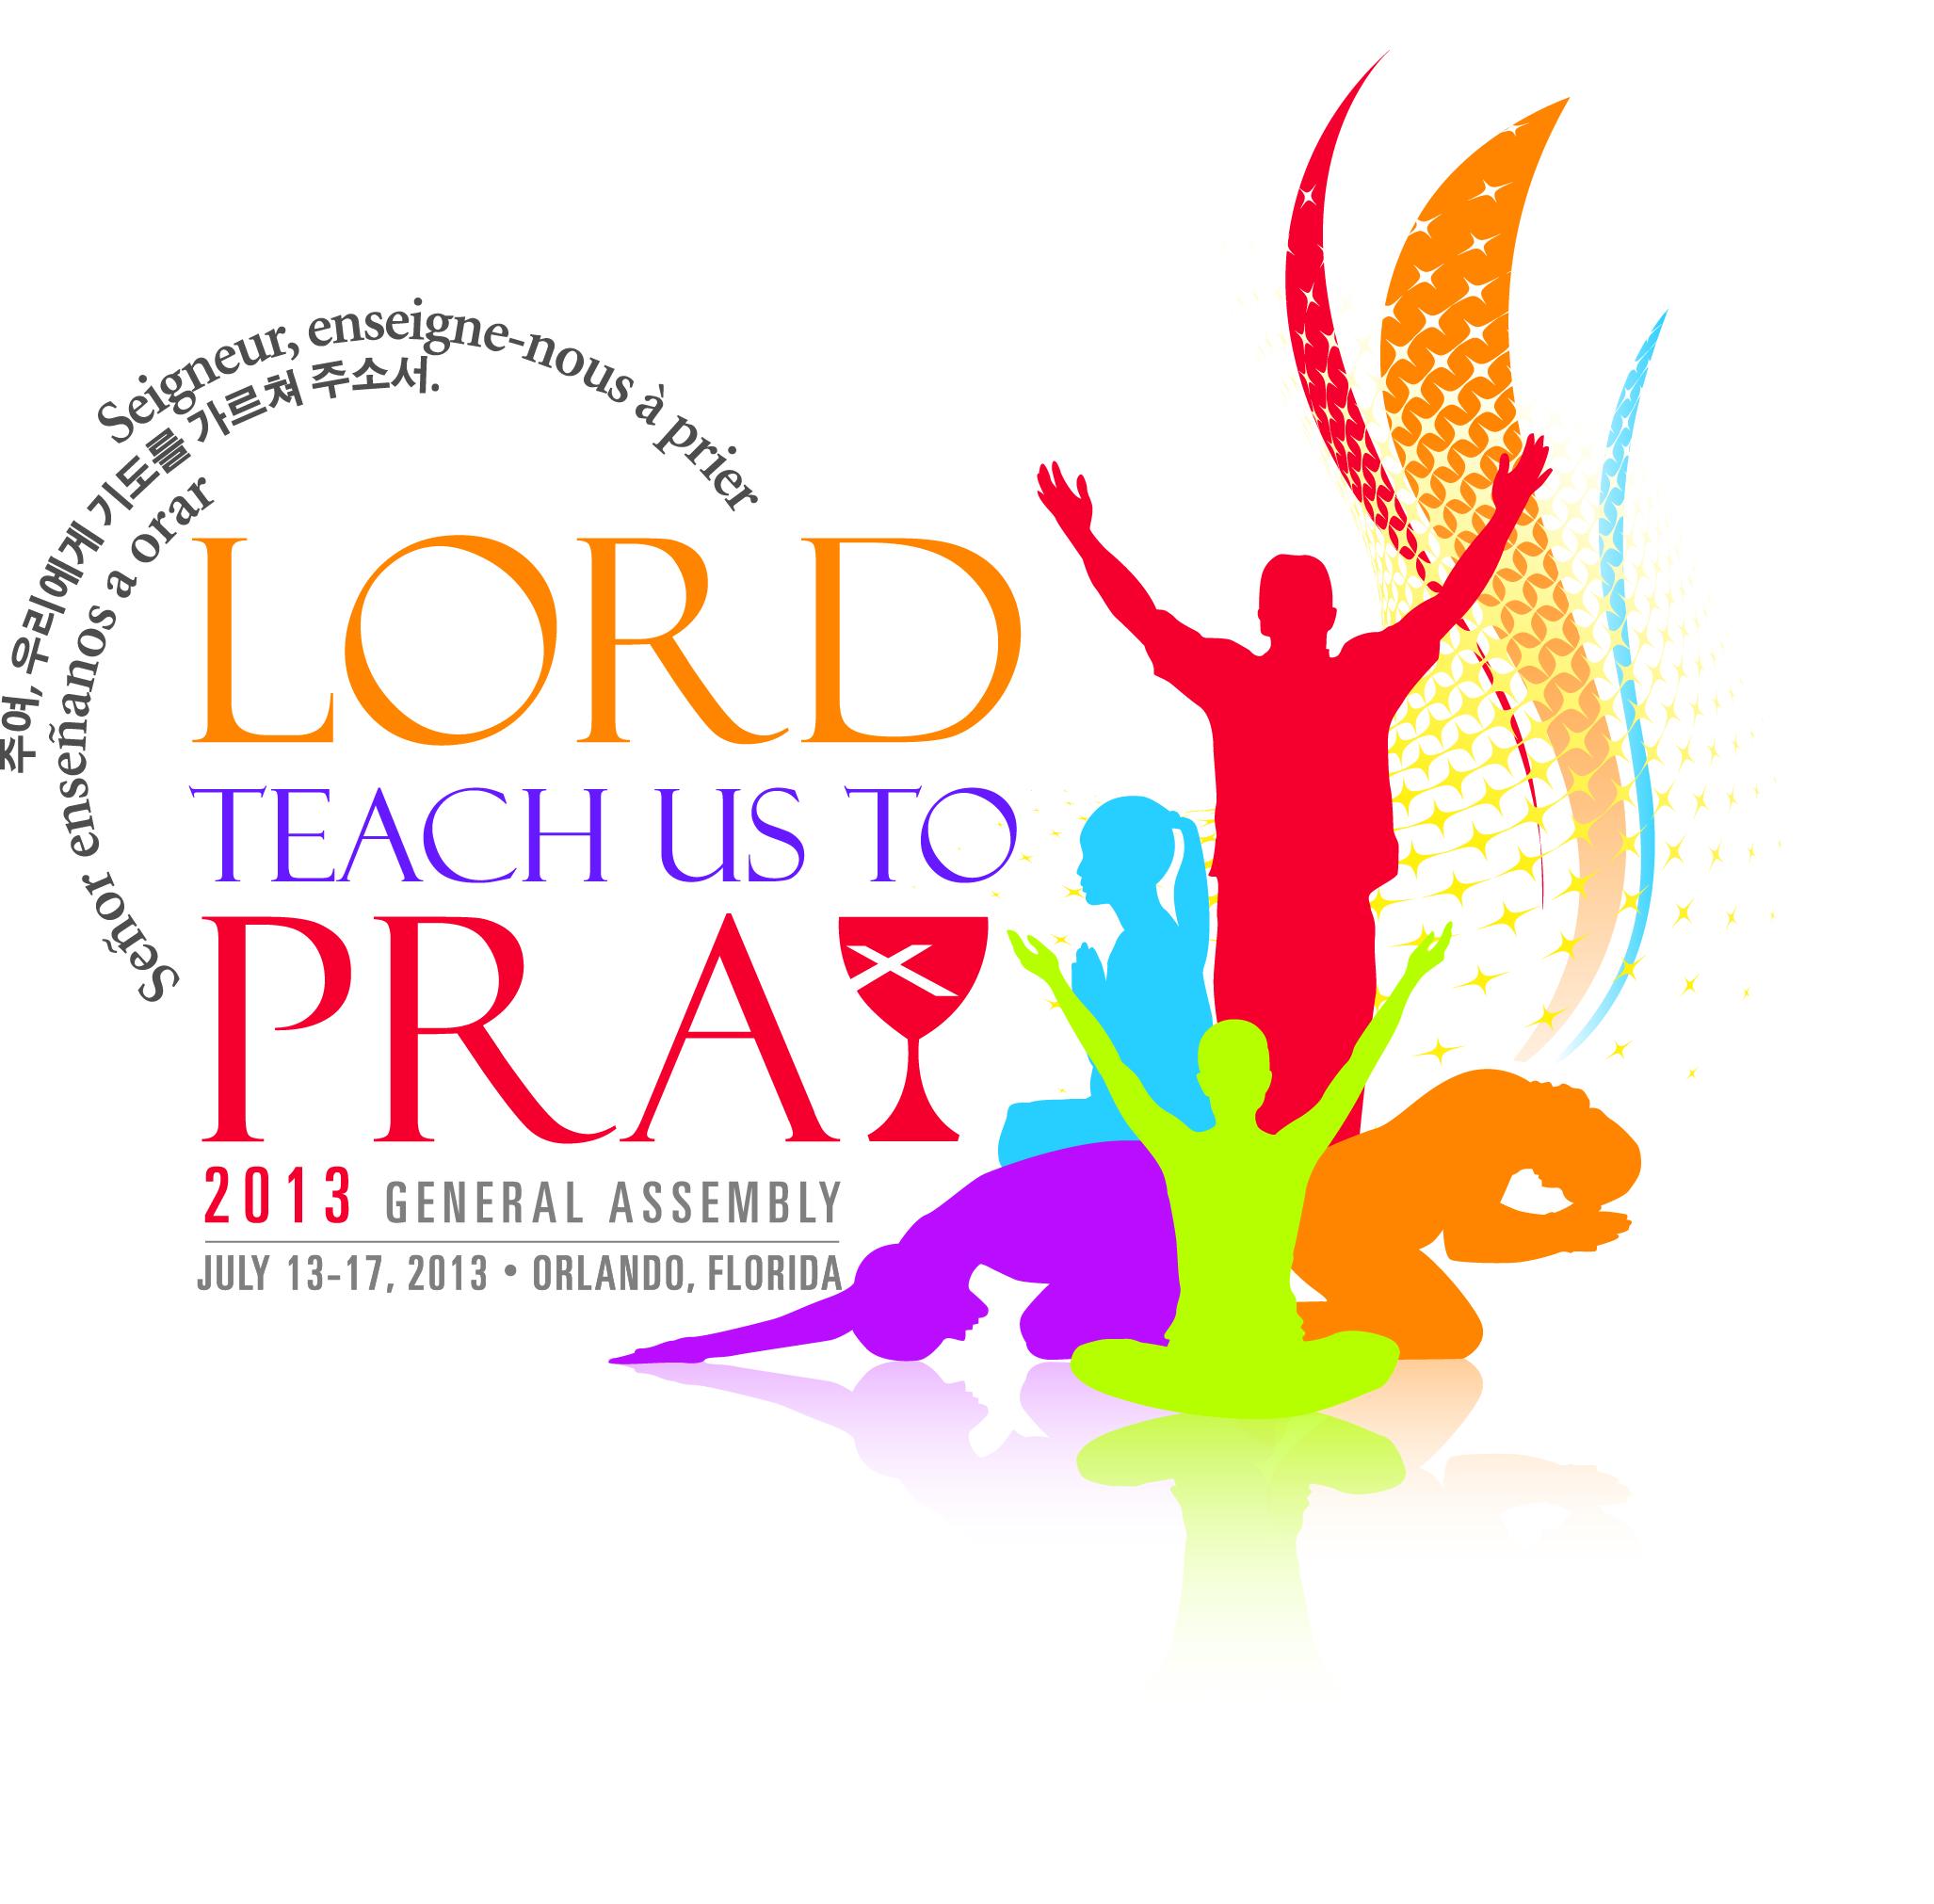 Let Us Pray for Belonging for ALL!